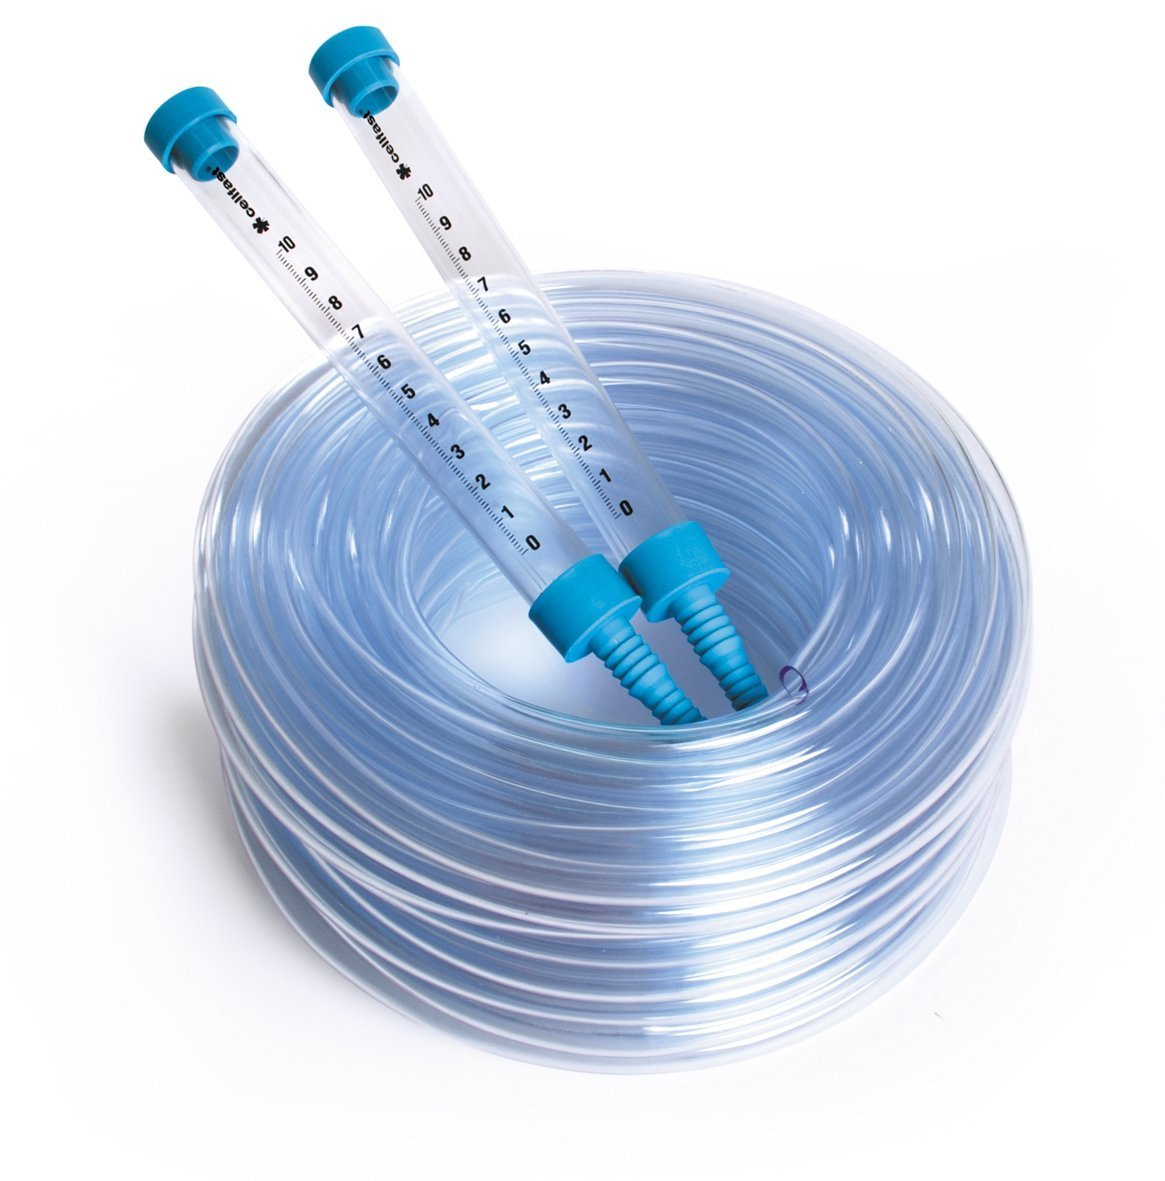 Quantum Garden QG-LH-BL-10 - Manguera con 2 tubos de agua (calibre de agua, 10 m), color transparente y azul